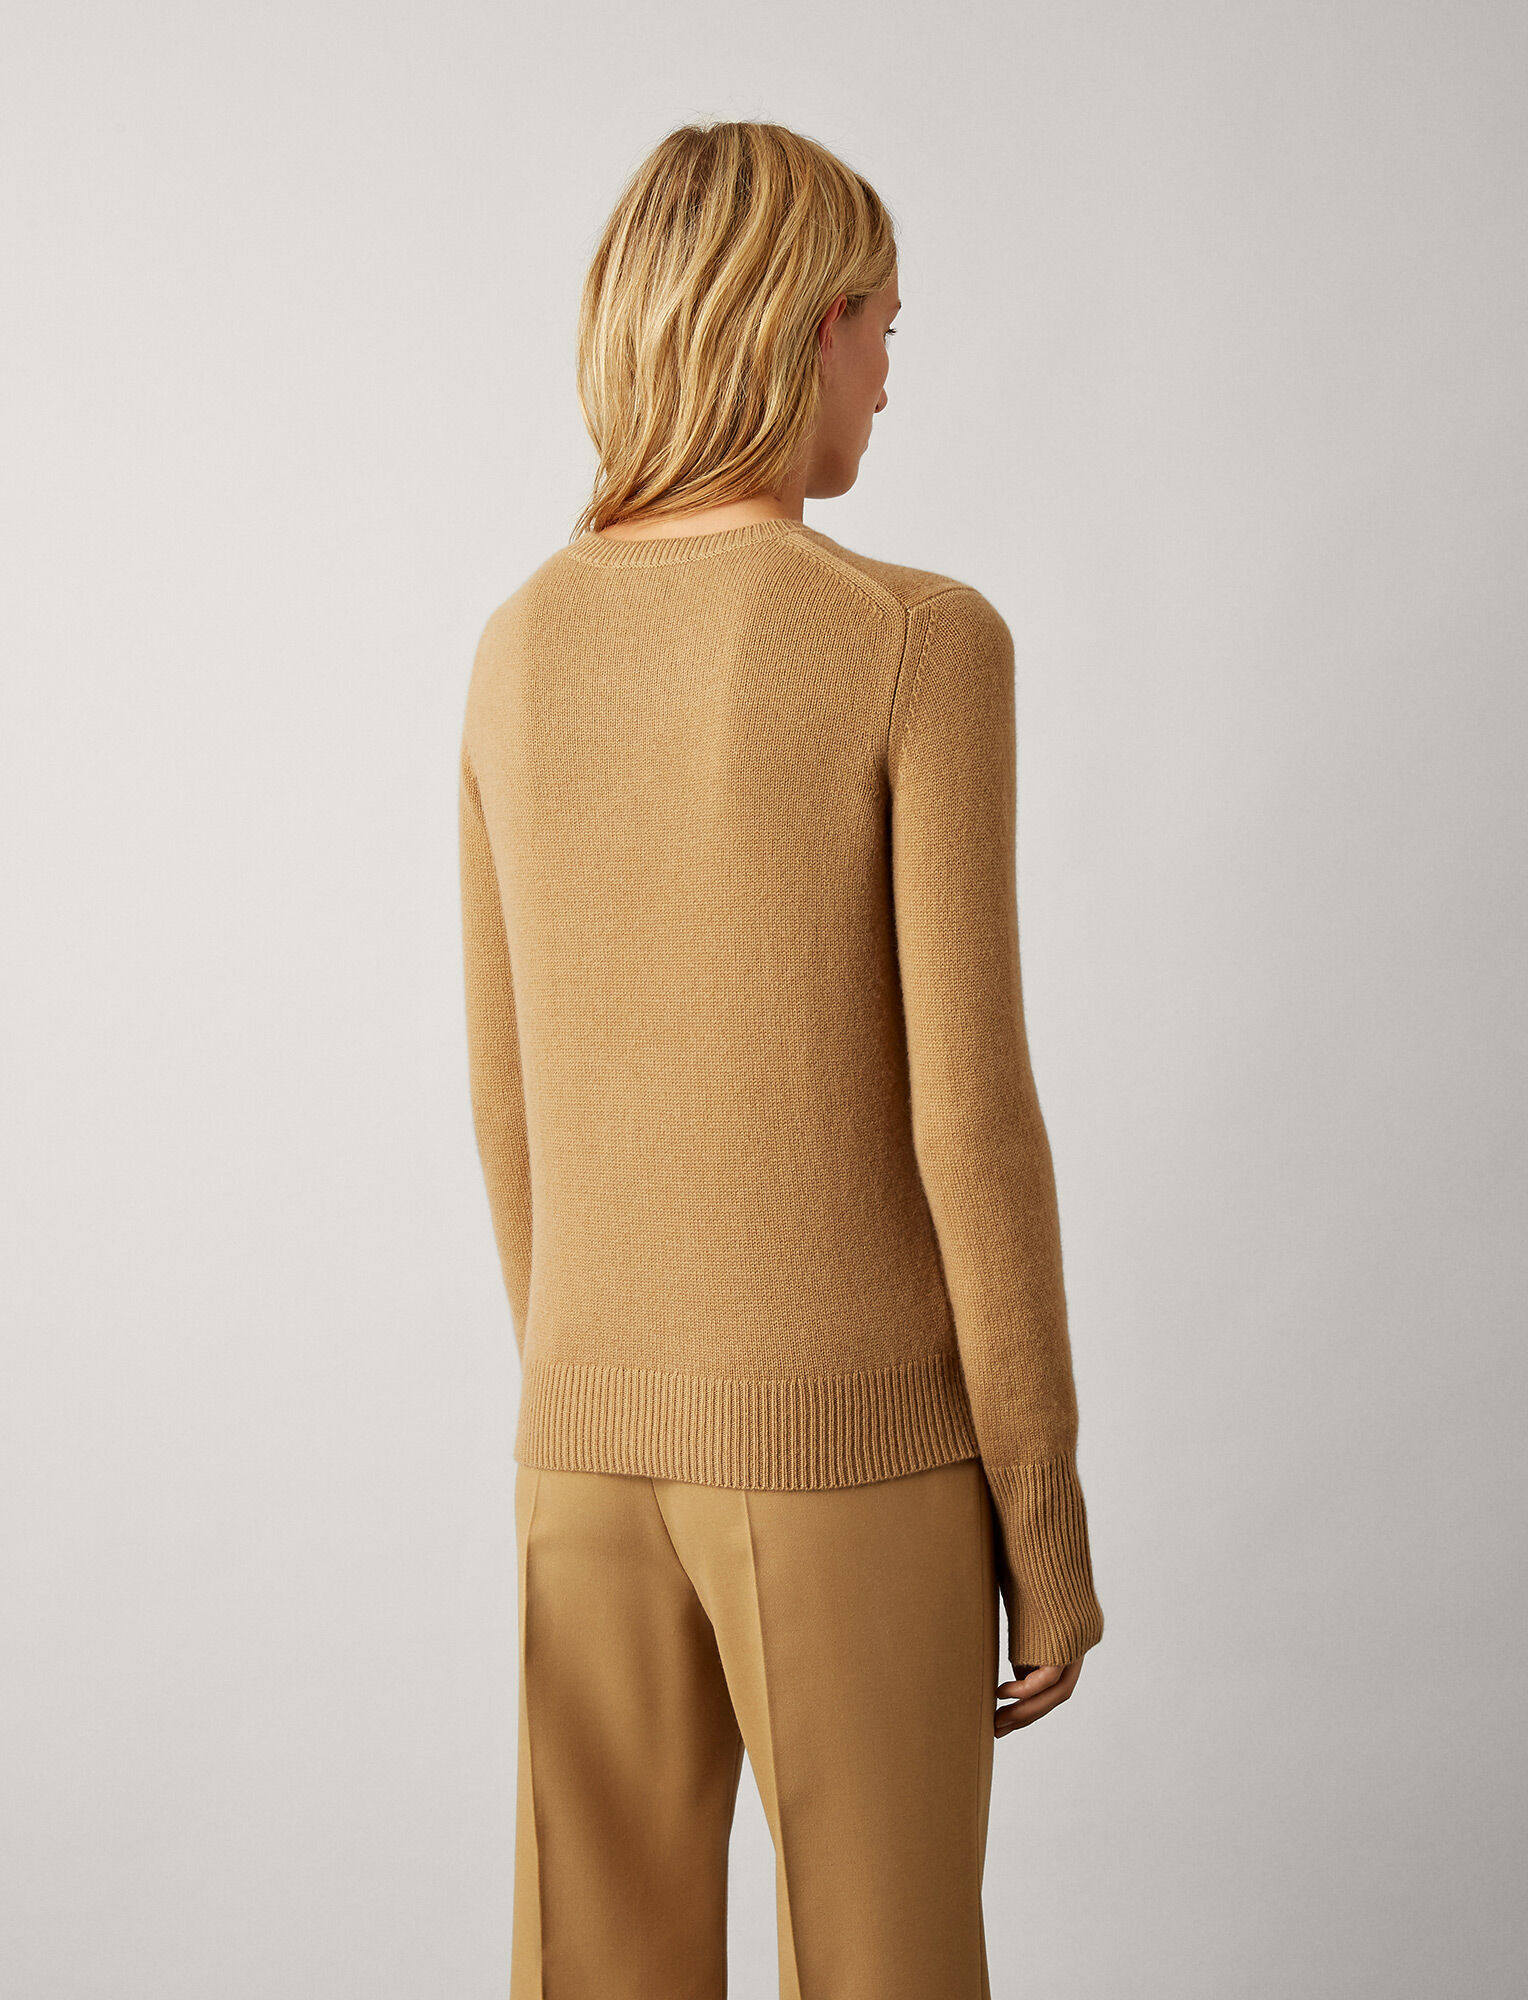 Joseph, Pure Cashmere Knit, in CAMEL